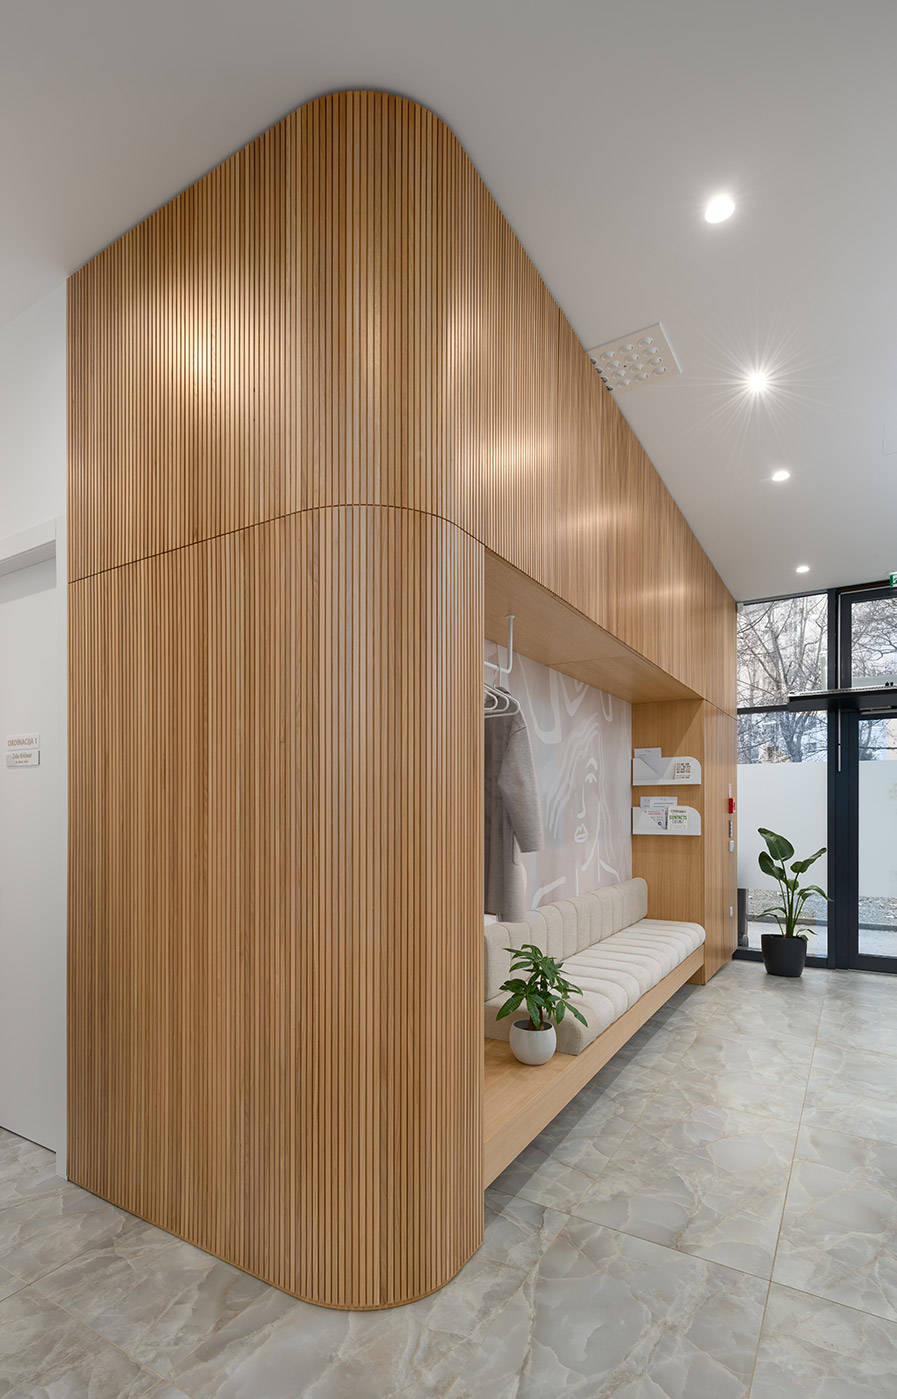 Dental clinic, Medical facilities interior design